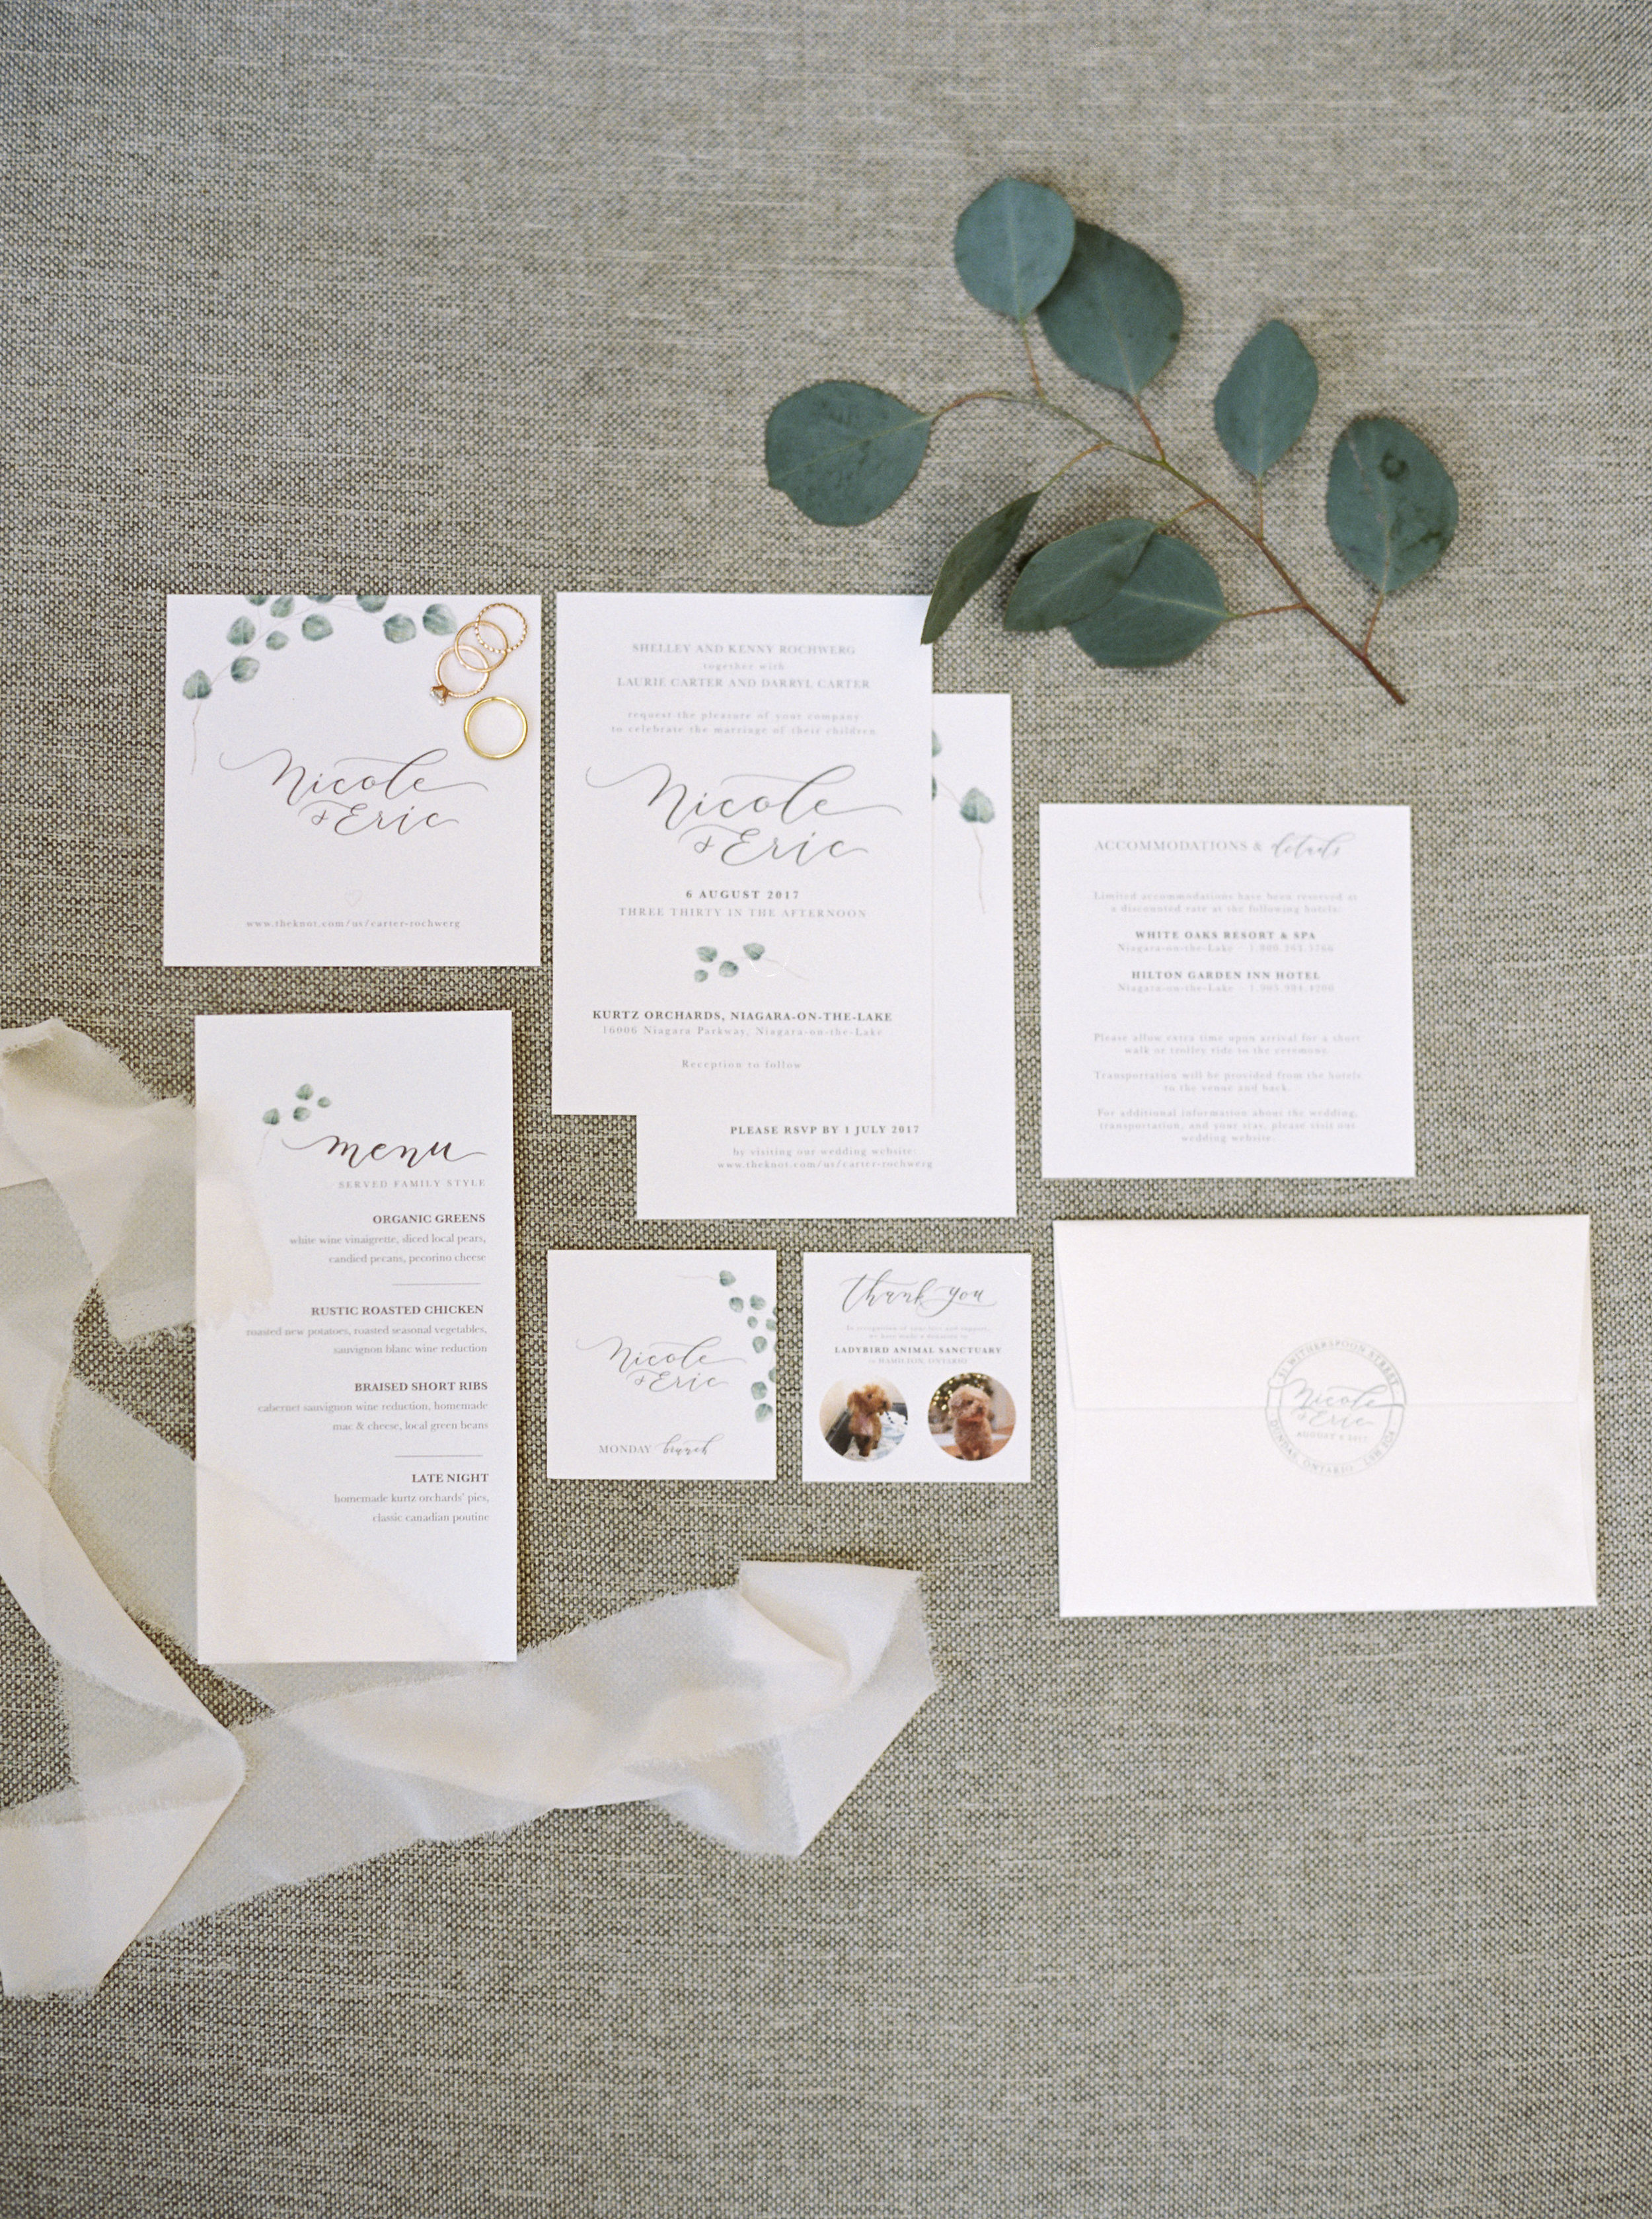 Niagara-on-the-Lake Wedding | Andrew Mark Photography | Vivian Lyttle Events | Ontario Wedding | Ontario Photographer | Fine Art Wedding Blog | Backyard Wedding | Joy Wed